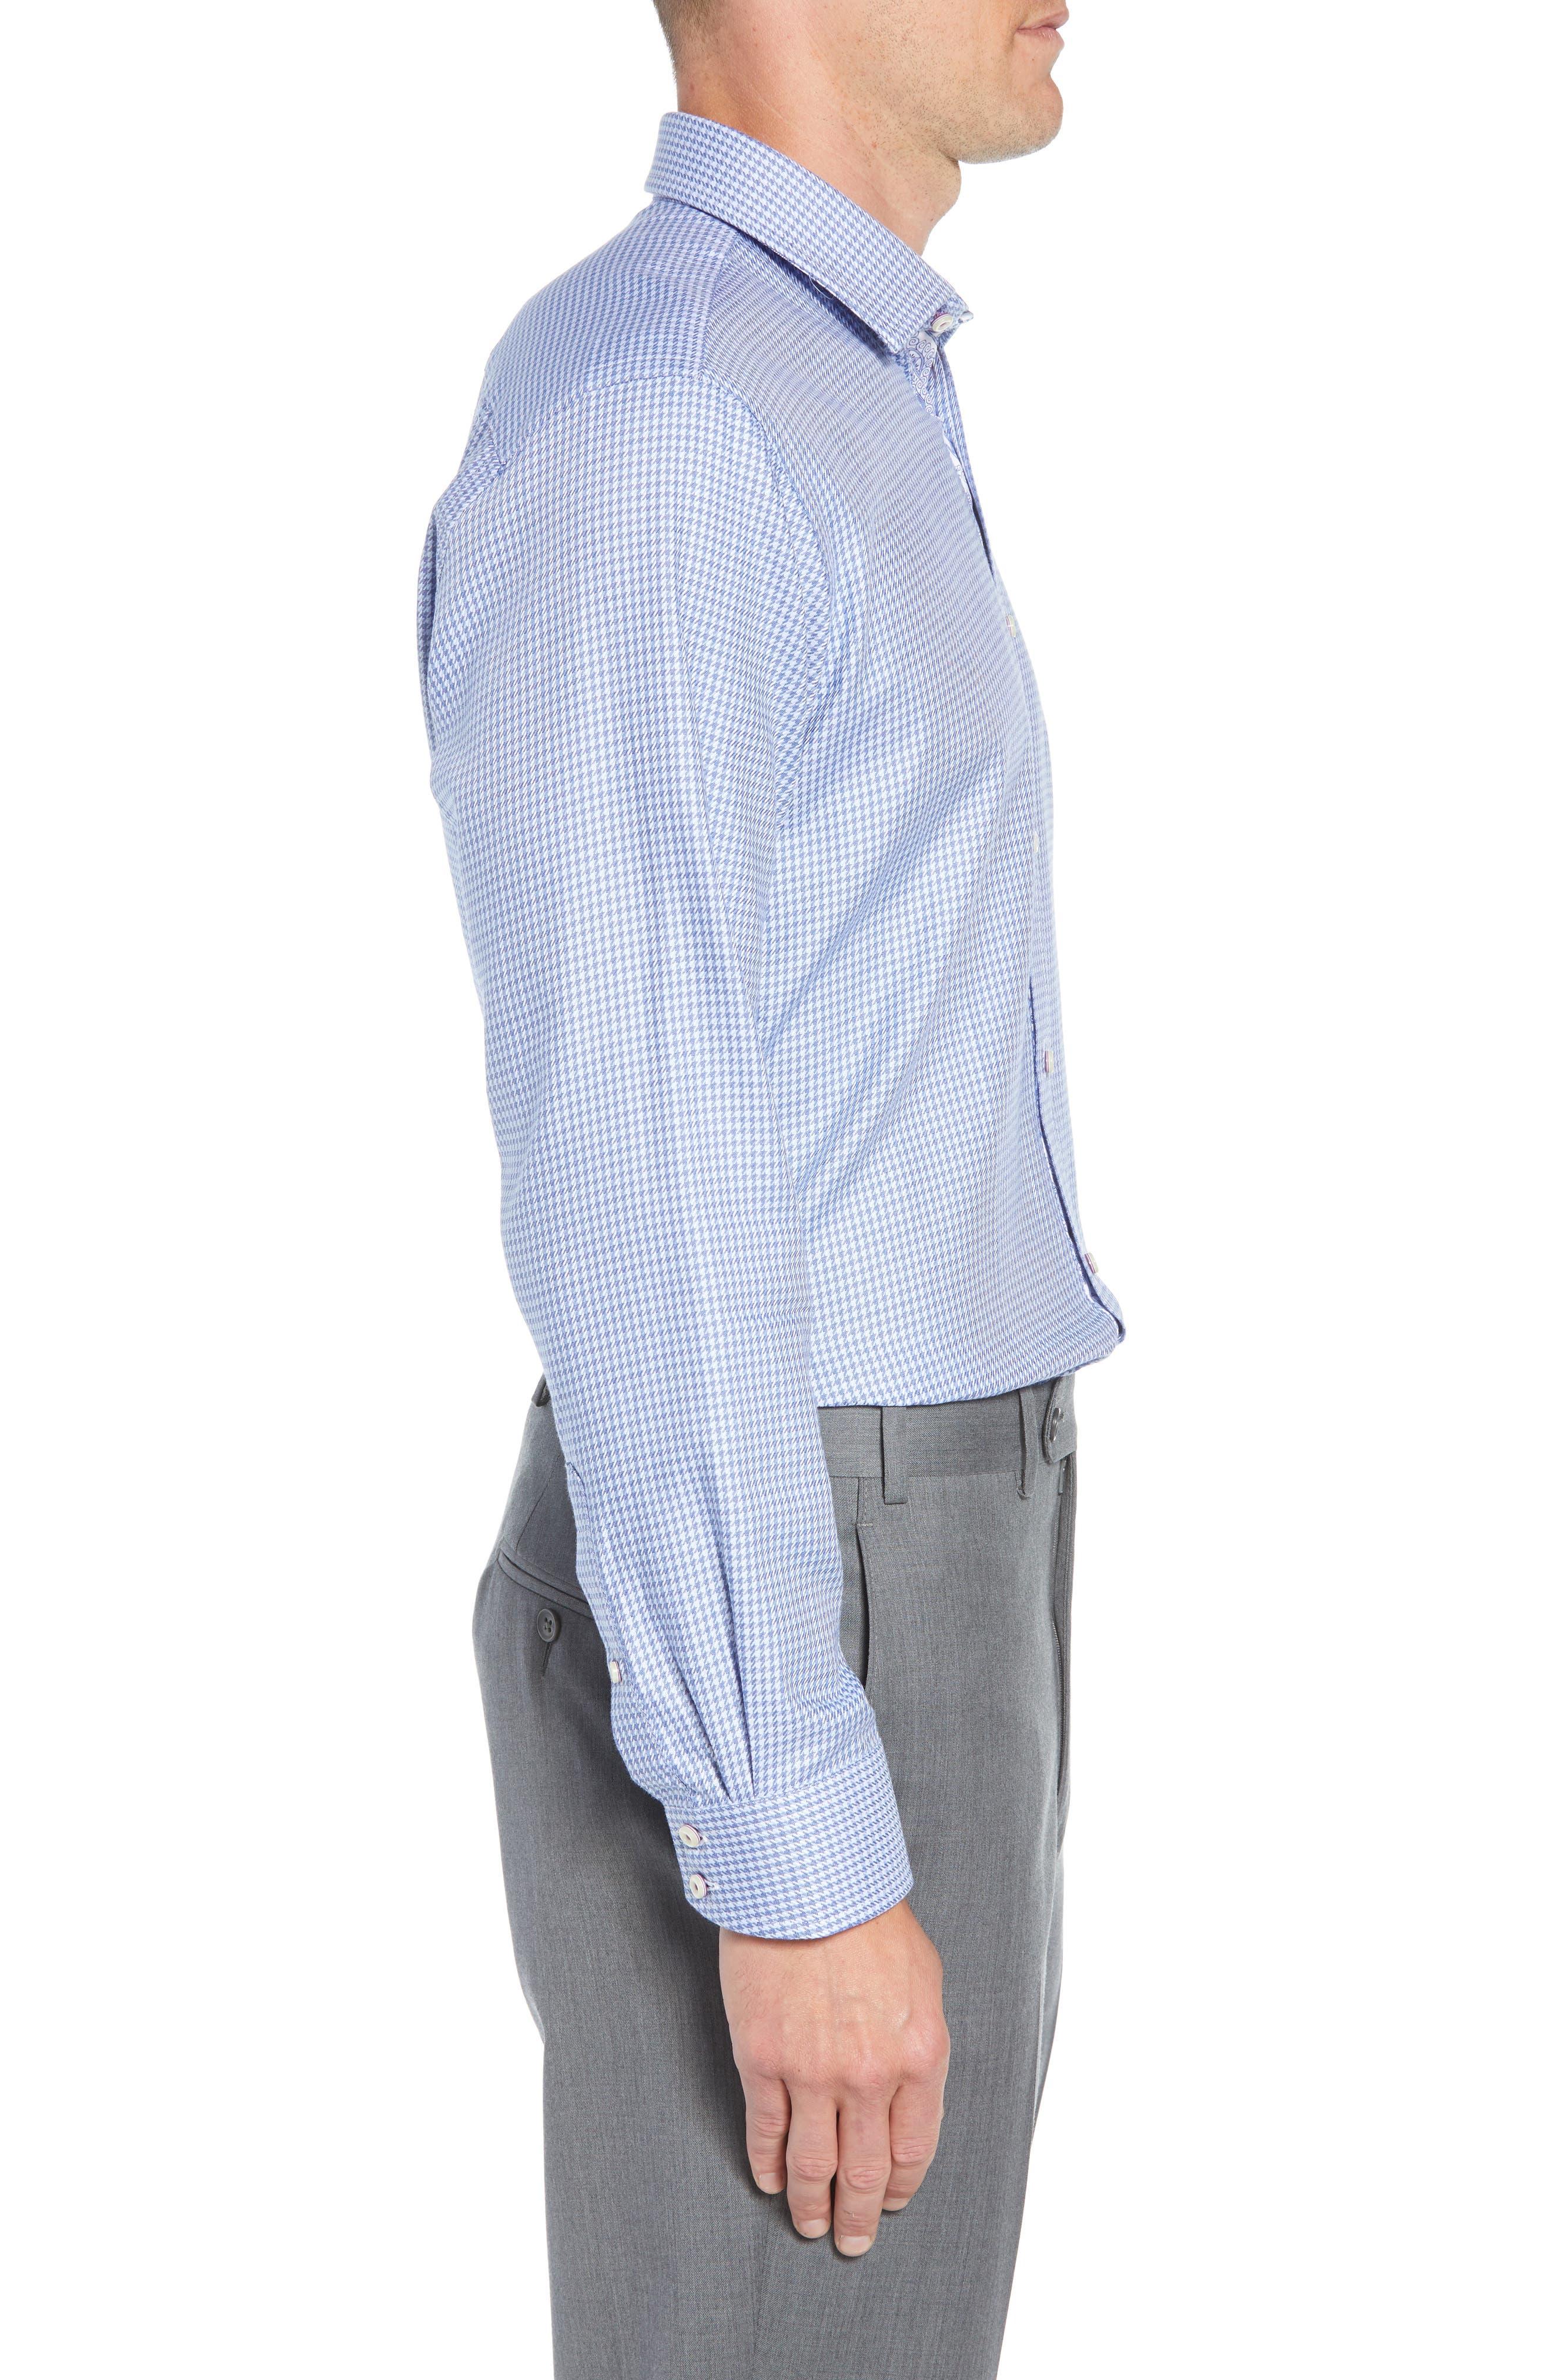 Franks Trim Fit Houndstooth Dress Shirt,                             Alternate thumbnail 4, color,                             BLUE